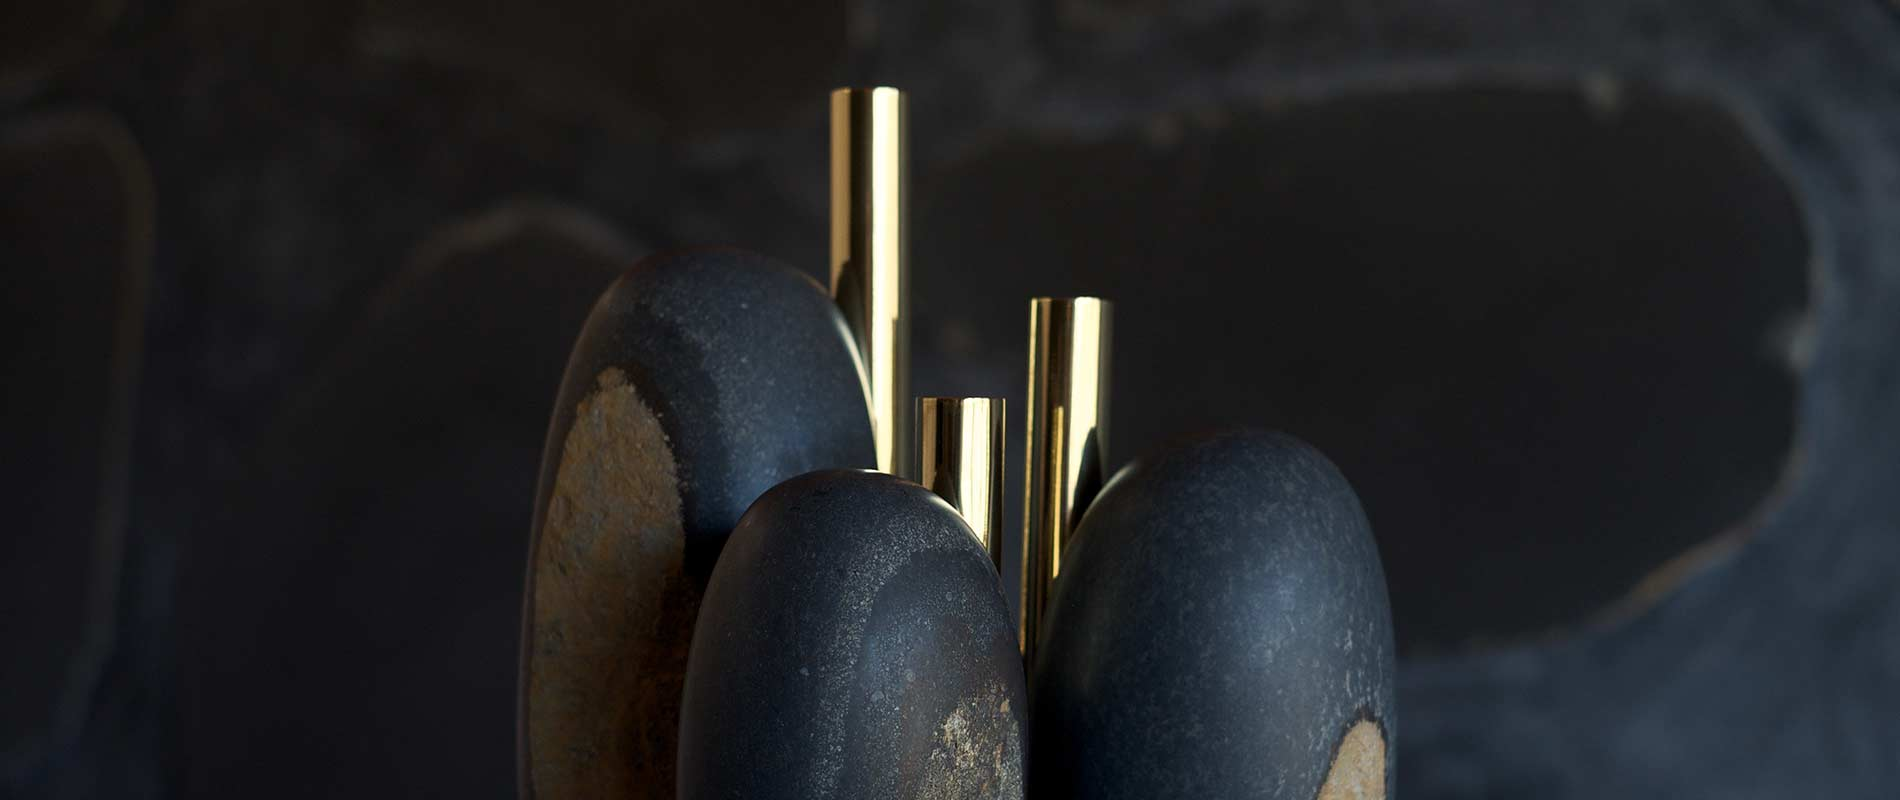 Okurayama Studio and Dan Yeffet, the art of craft. Date Kan, datekan vulcanic stones Japan